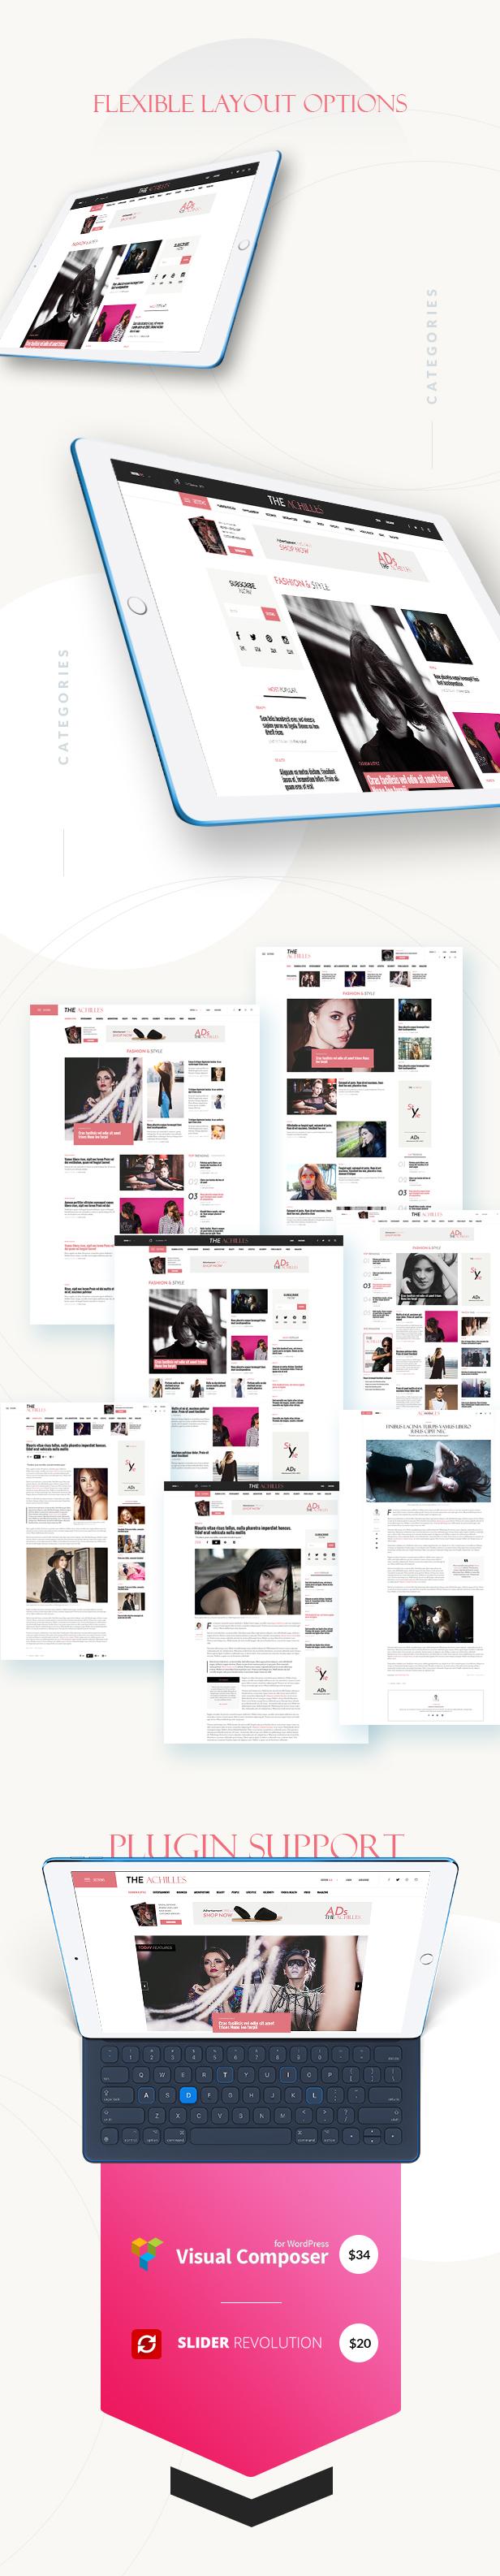 Achilles - Multipurpose Magazine & Blog WordPress Theme - 12